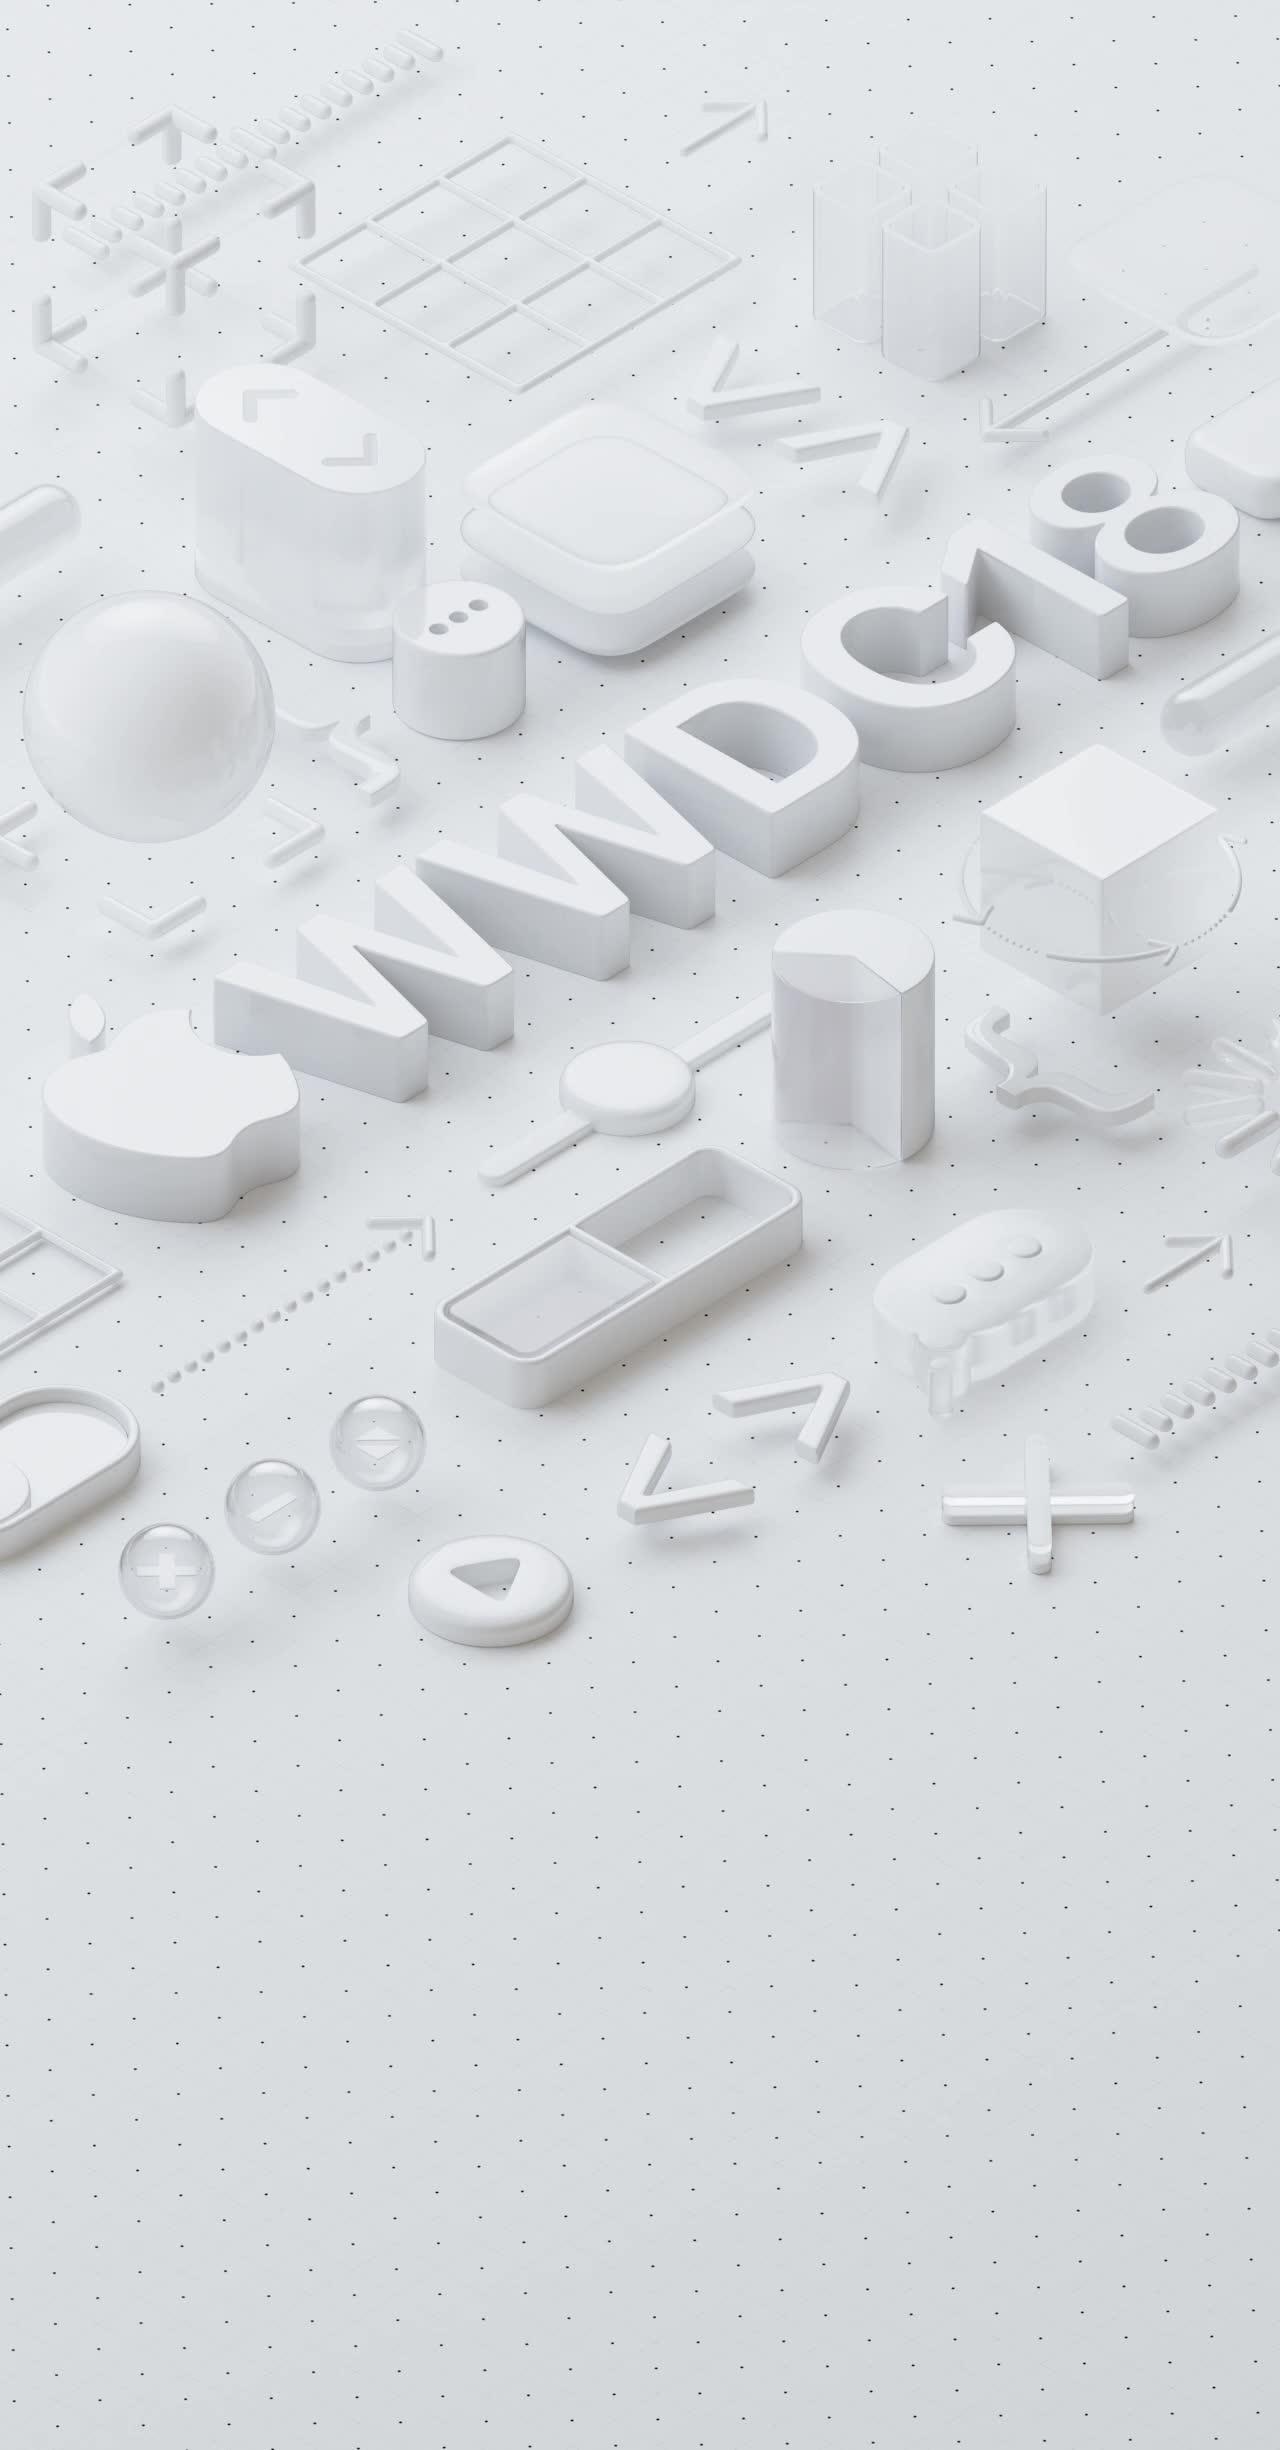 Wallpaper da WWDC 2018